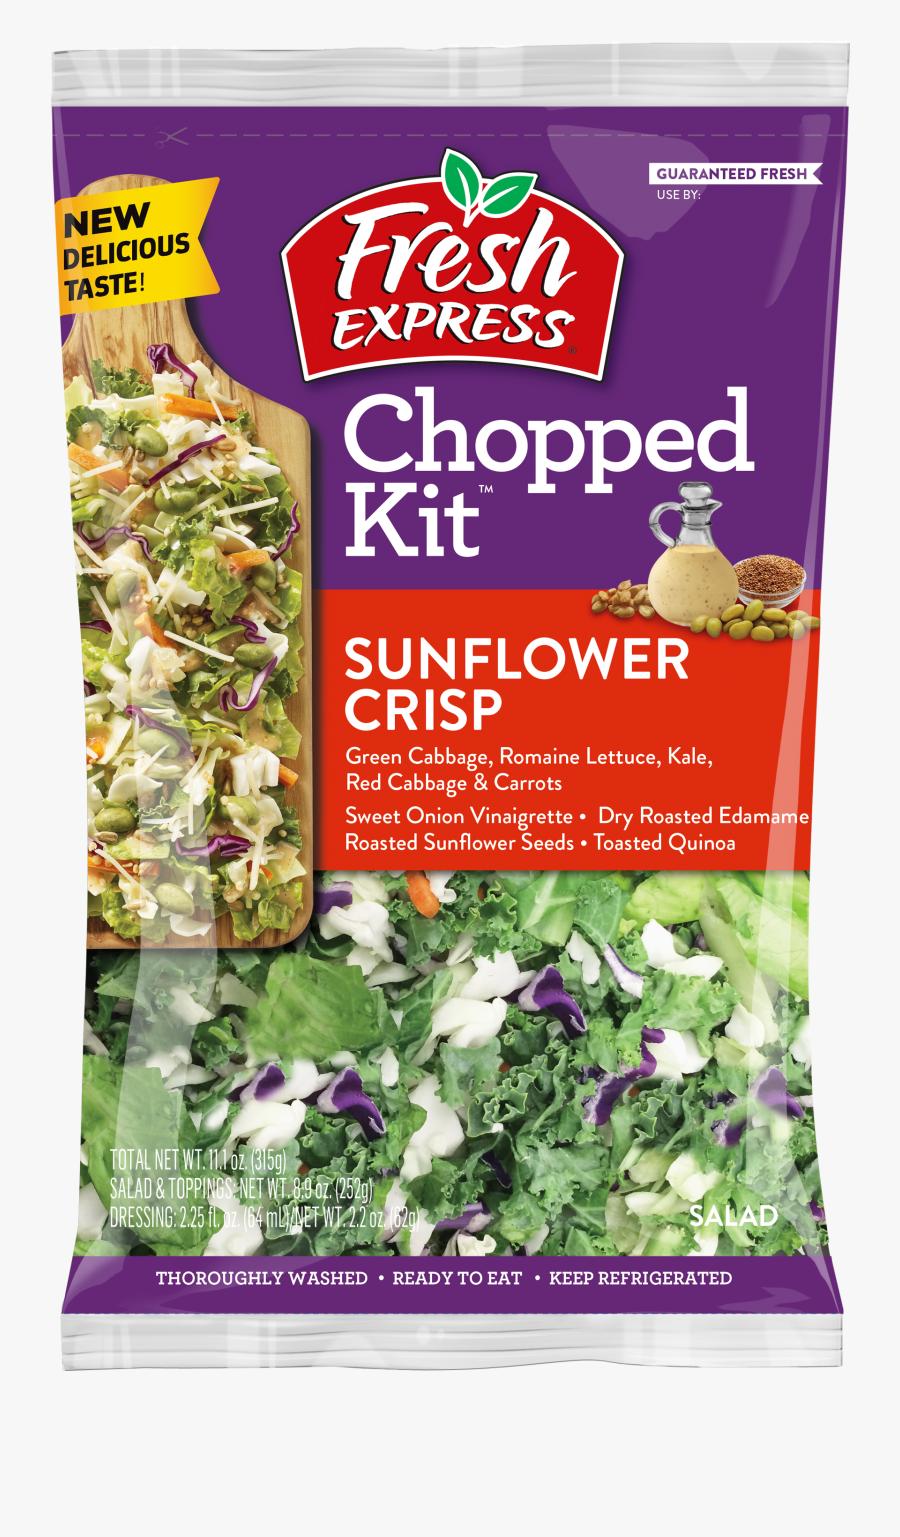 Sunflower Crisp Chopped Salad - Pomegranate Chopped Salad Kit, Transparent Clipart